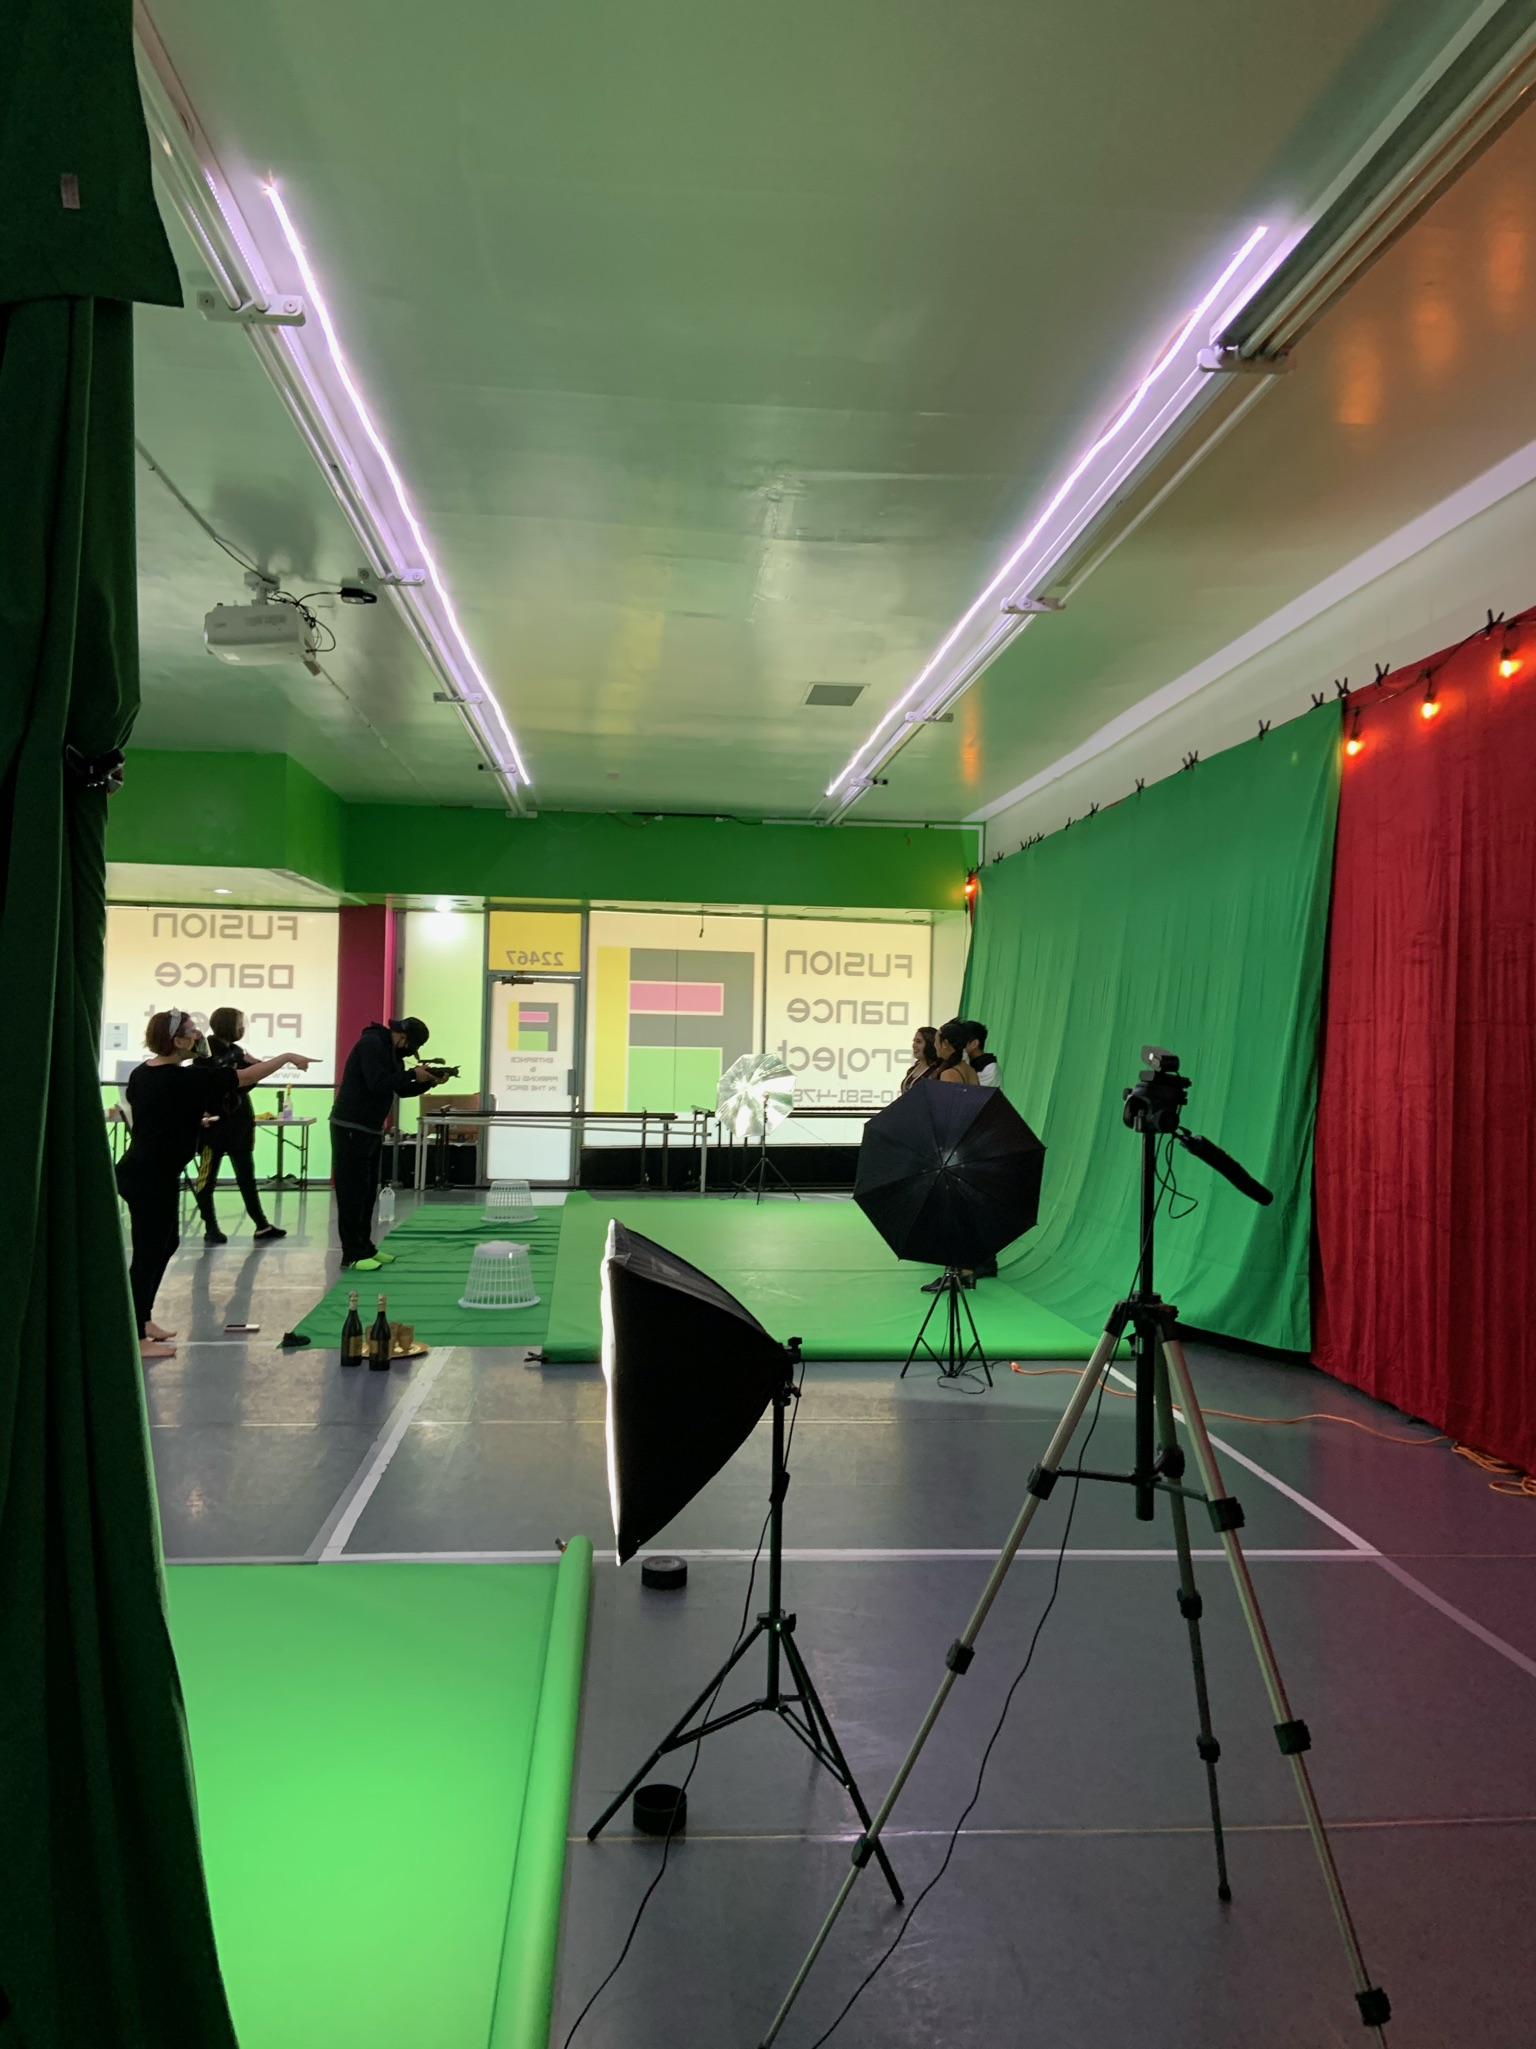 Nutcracker filming day 2020